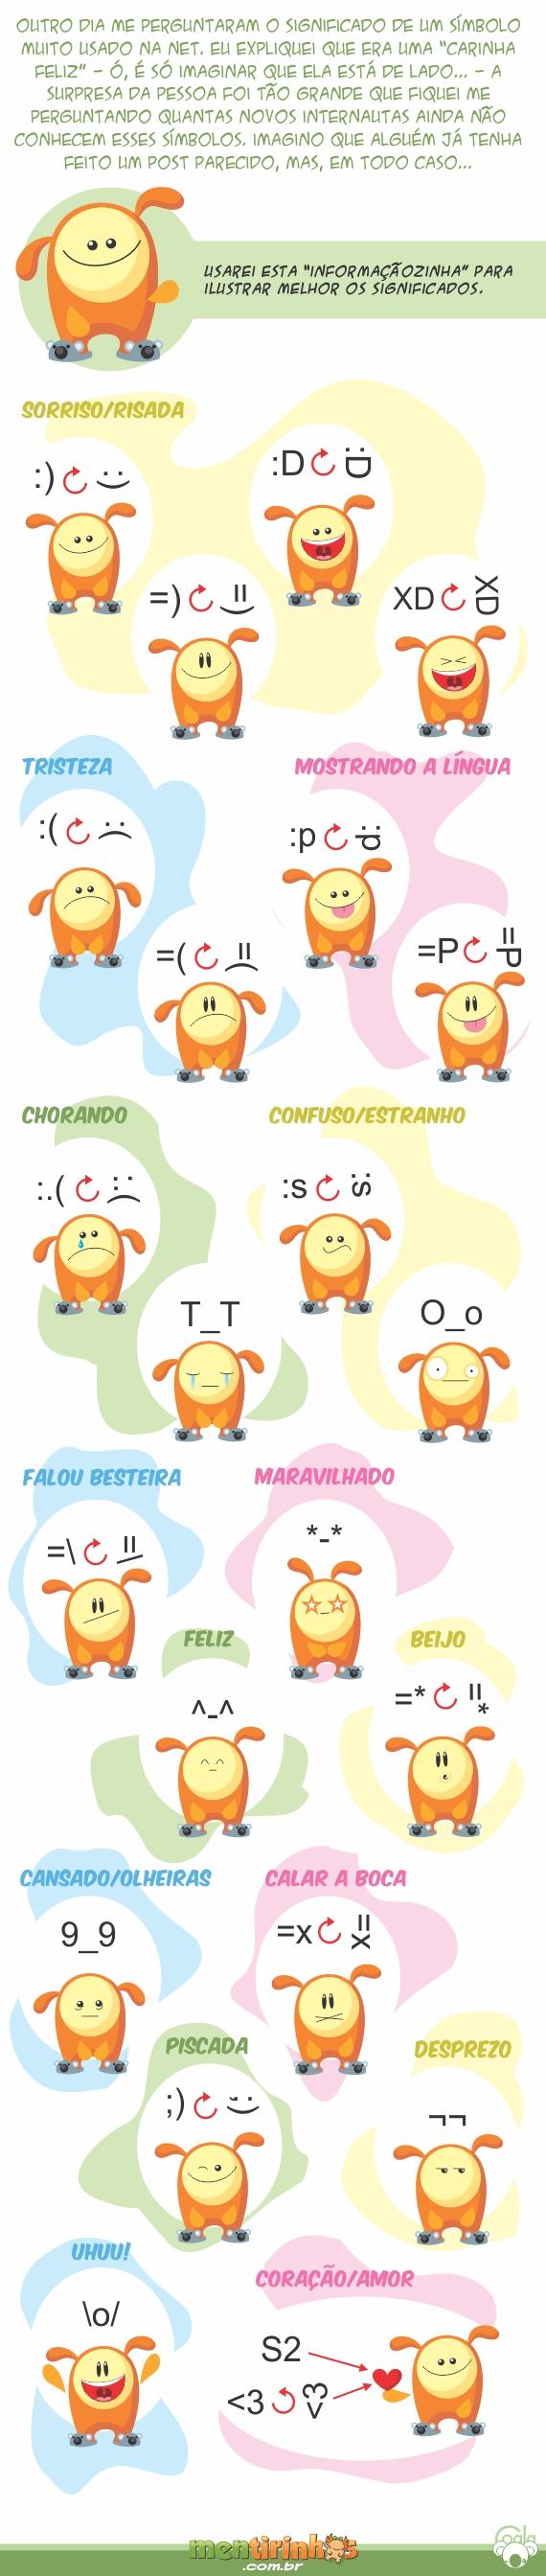 simbolos_net